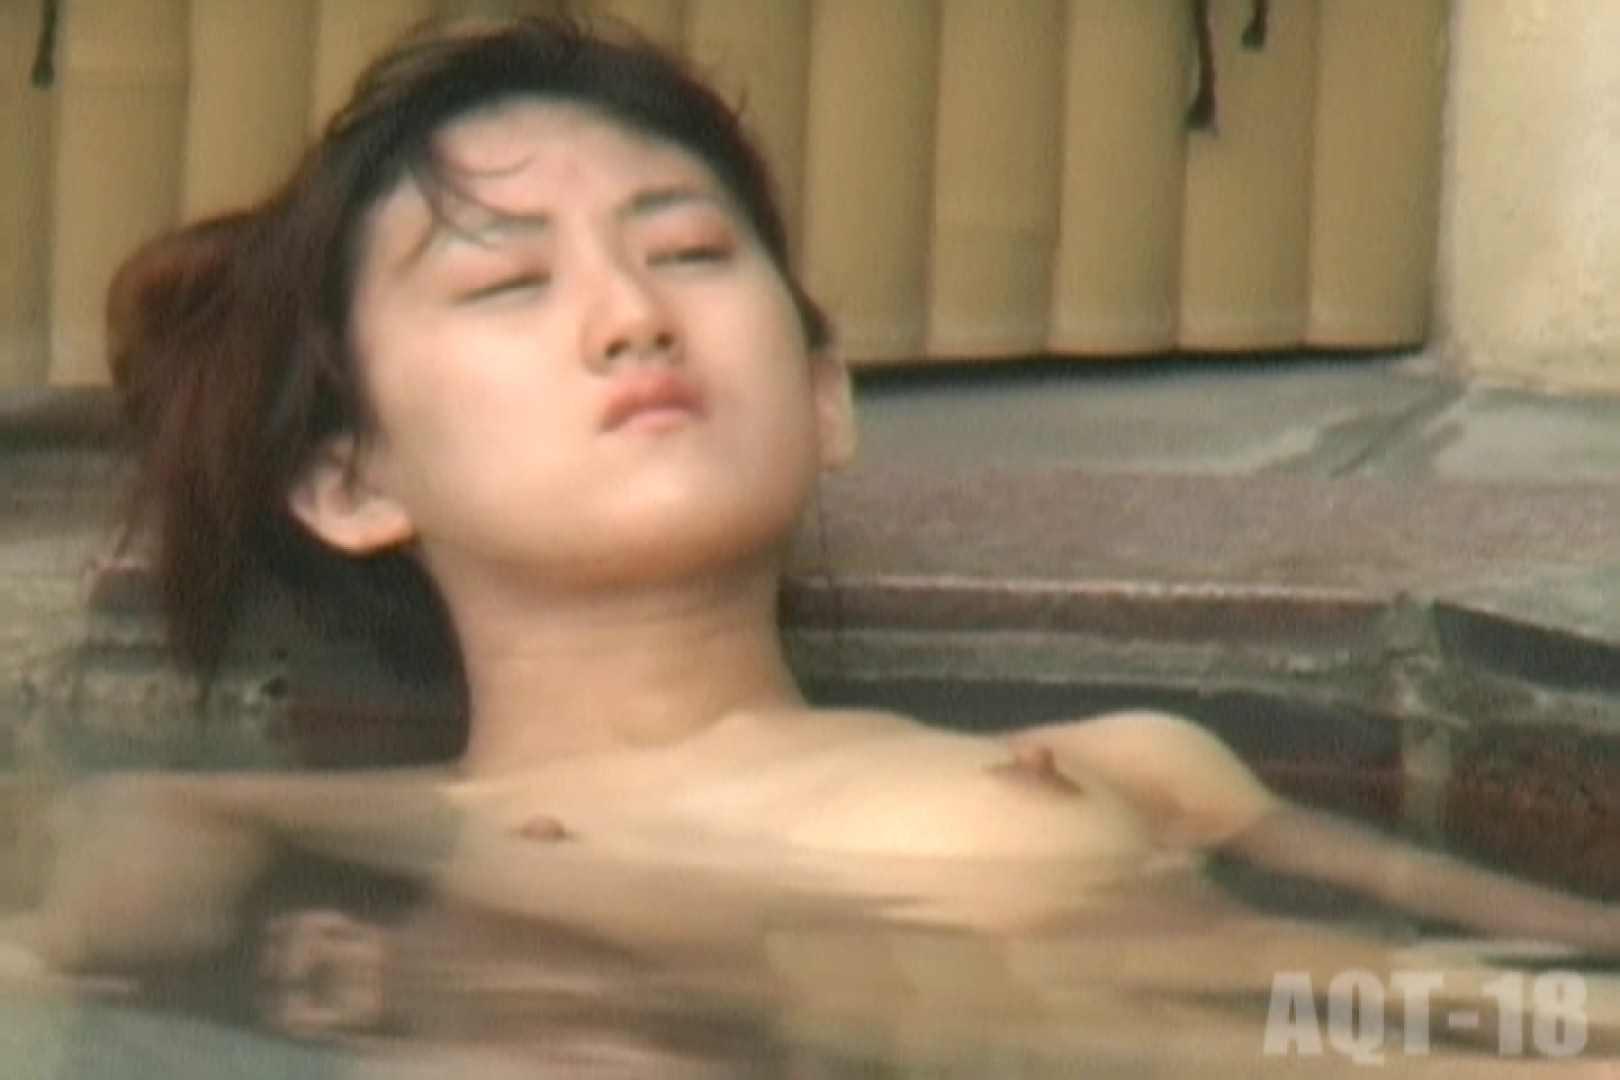 Aquaな露天風呂Vol.862 美しいOLの裸体 戯れ無修正画像 99pic 77